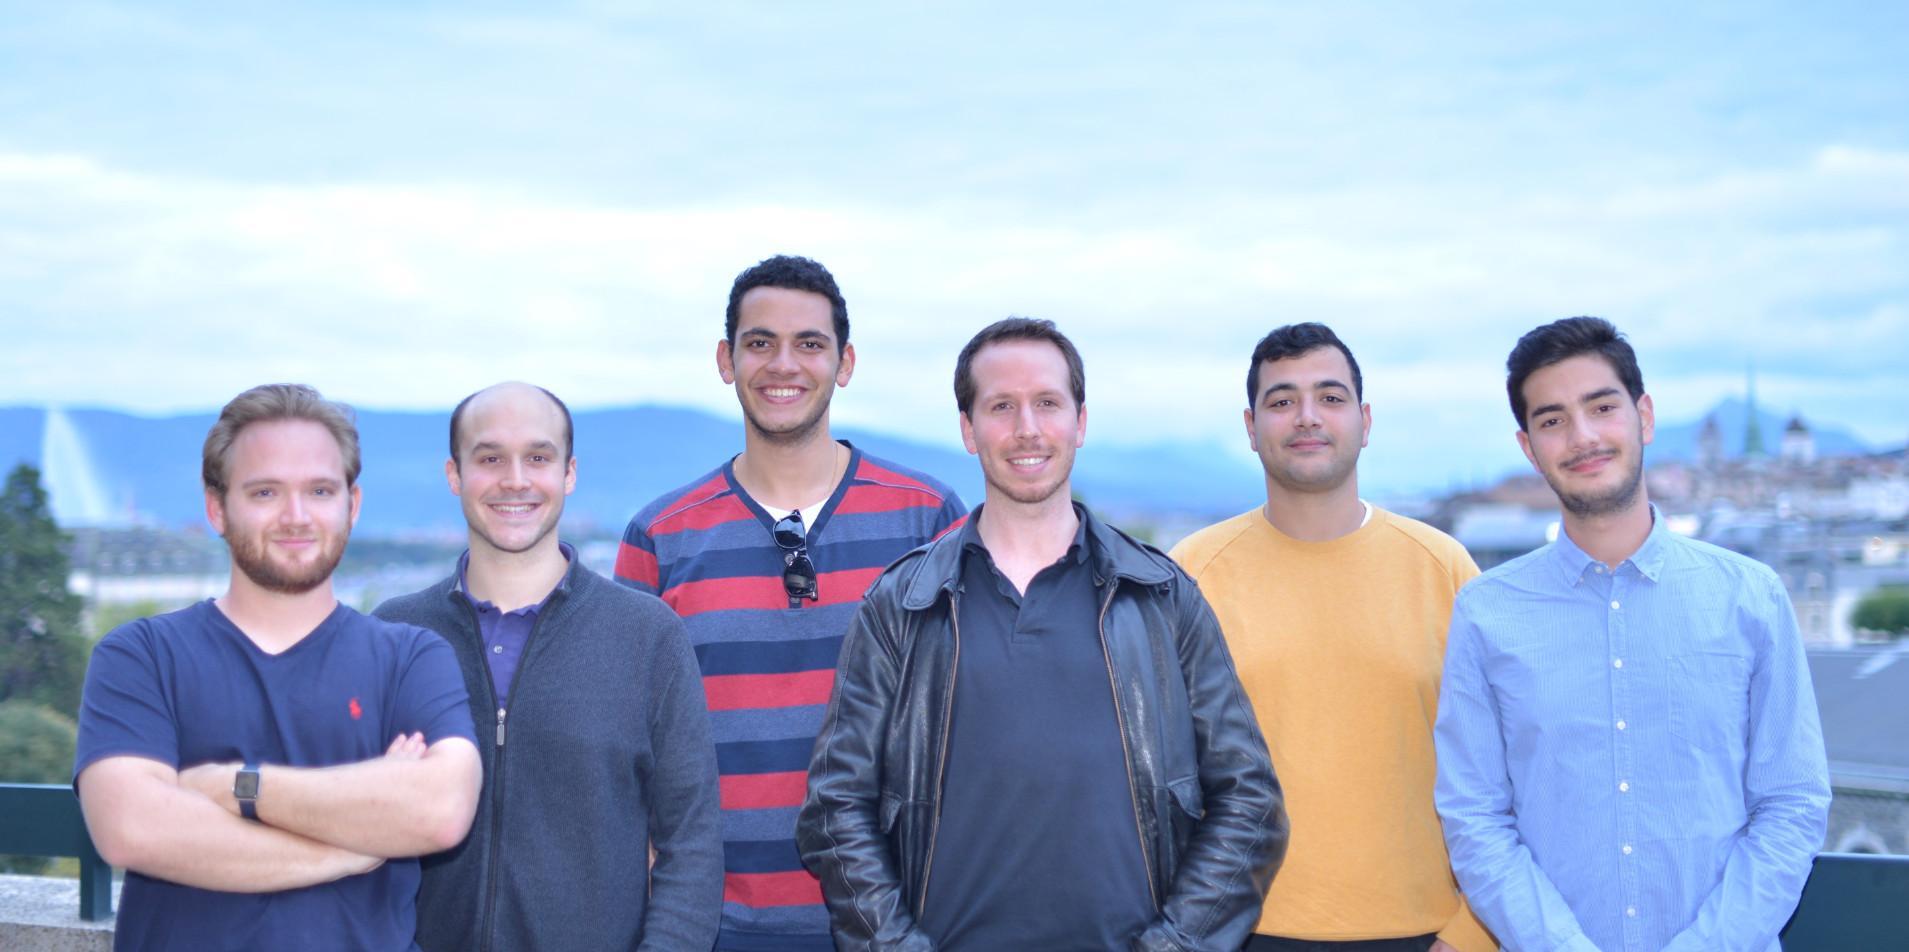 Daniel Prusak (CFO), Franck Canavesi (IT manager), Stéphane Sélim (Developper), Alexis Flouck (CEO), Nazim Boukli (Brand Manager) et Karim Assi (Developper)